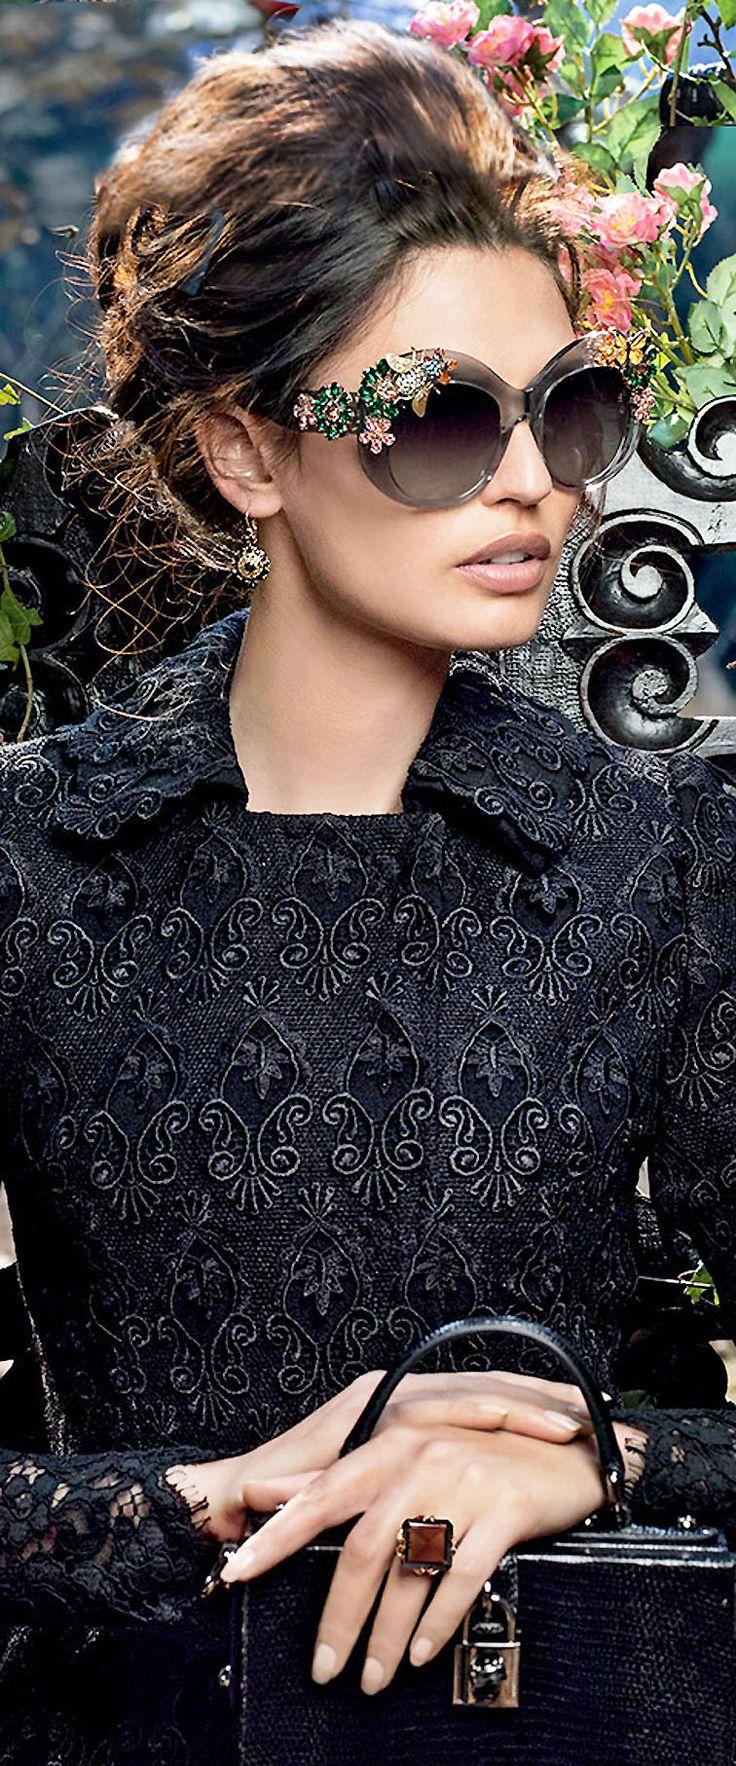 Dolce Gabbana Sunglasses ~ Winter 2015 ᘡղbᘠ